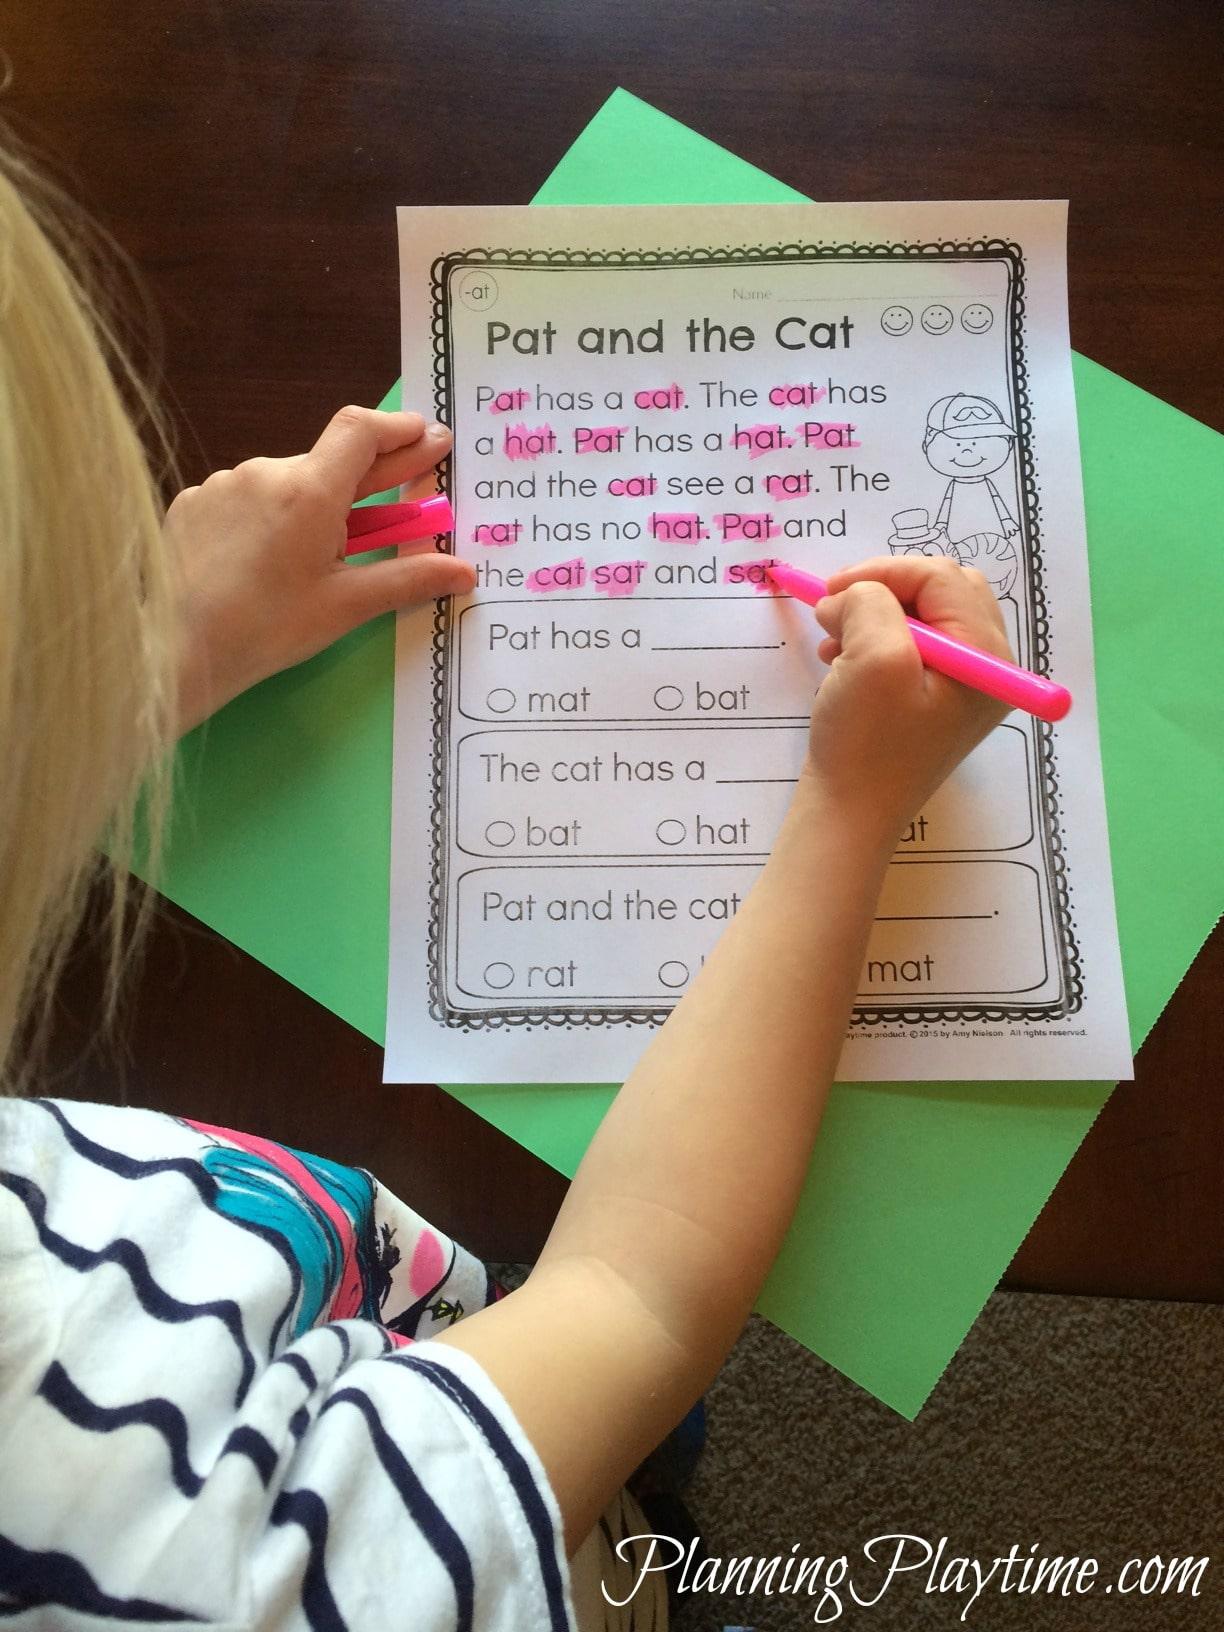 - Kindergarten Reading Comprehension - Planning Playtime